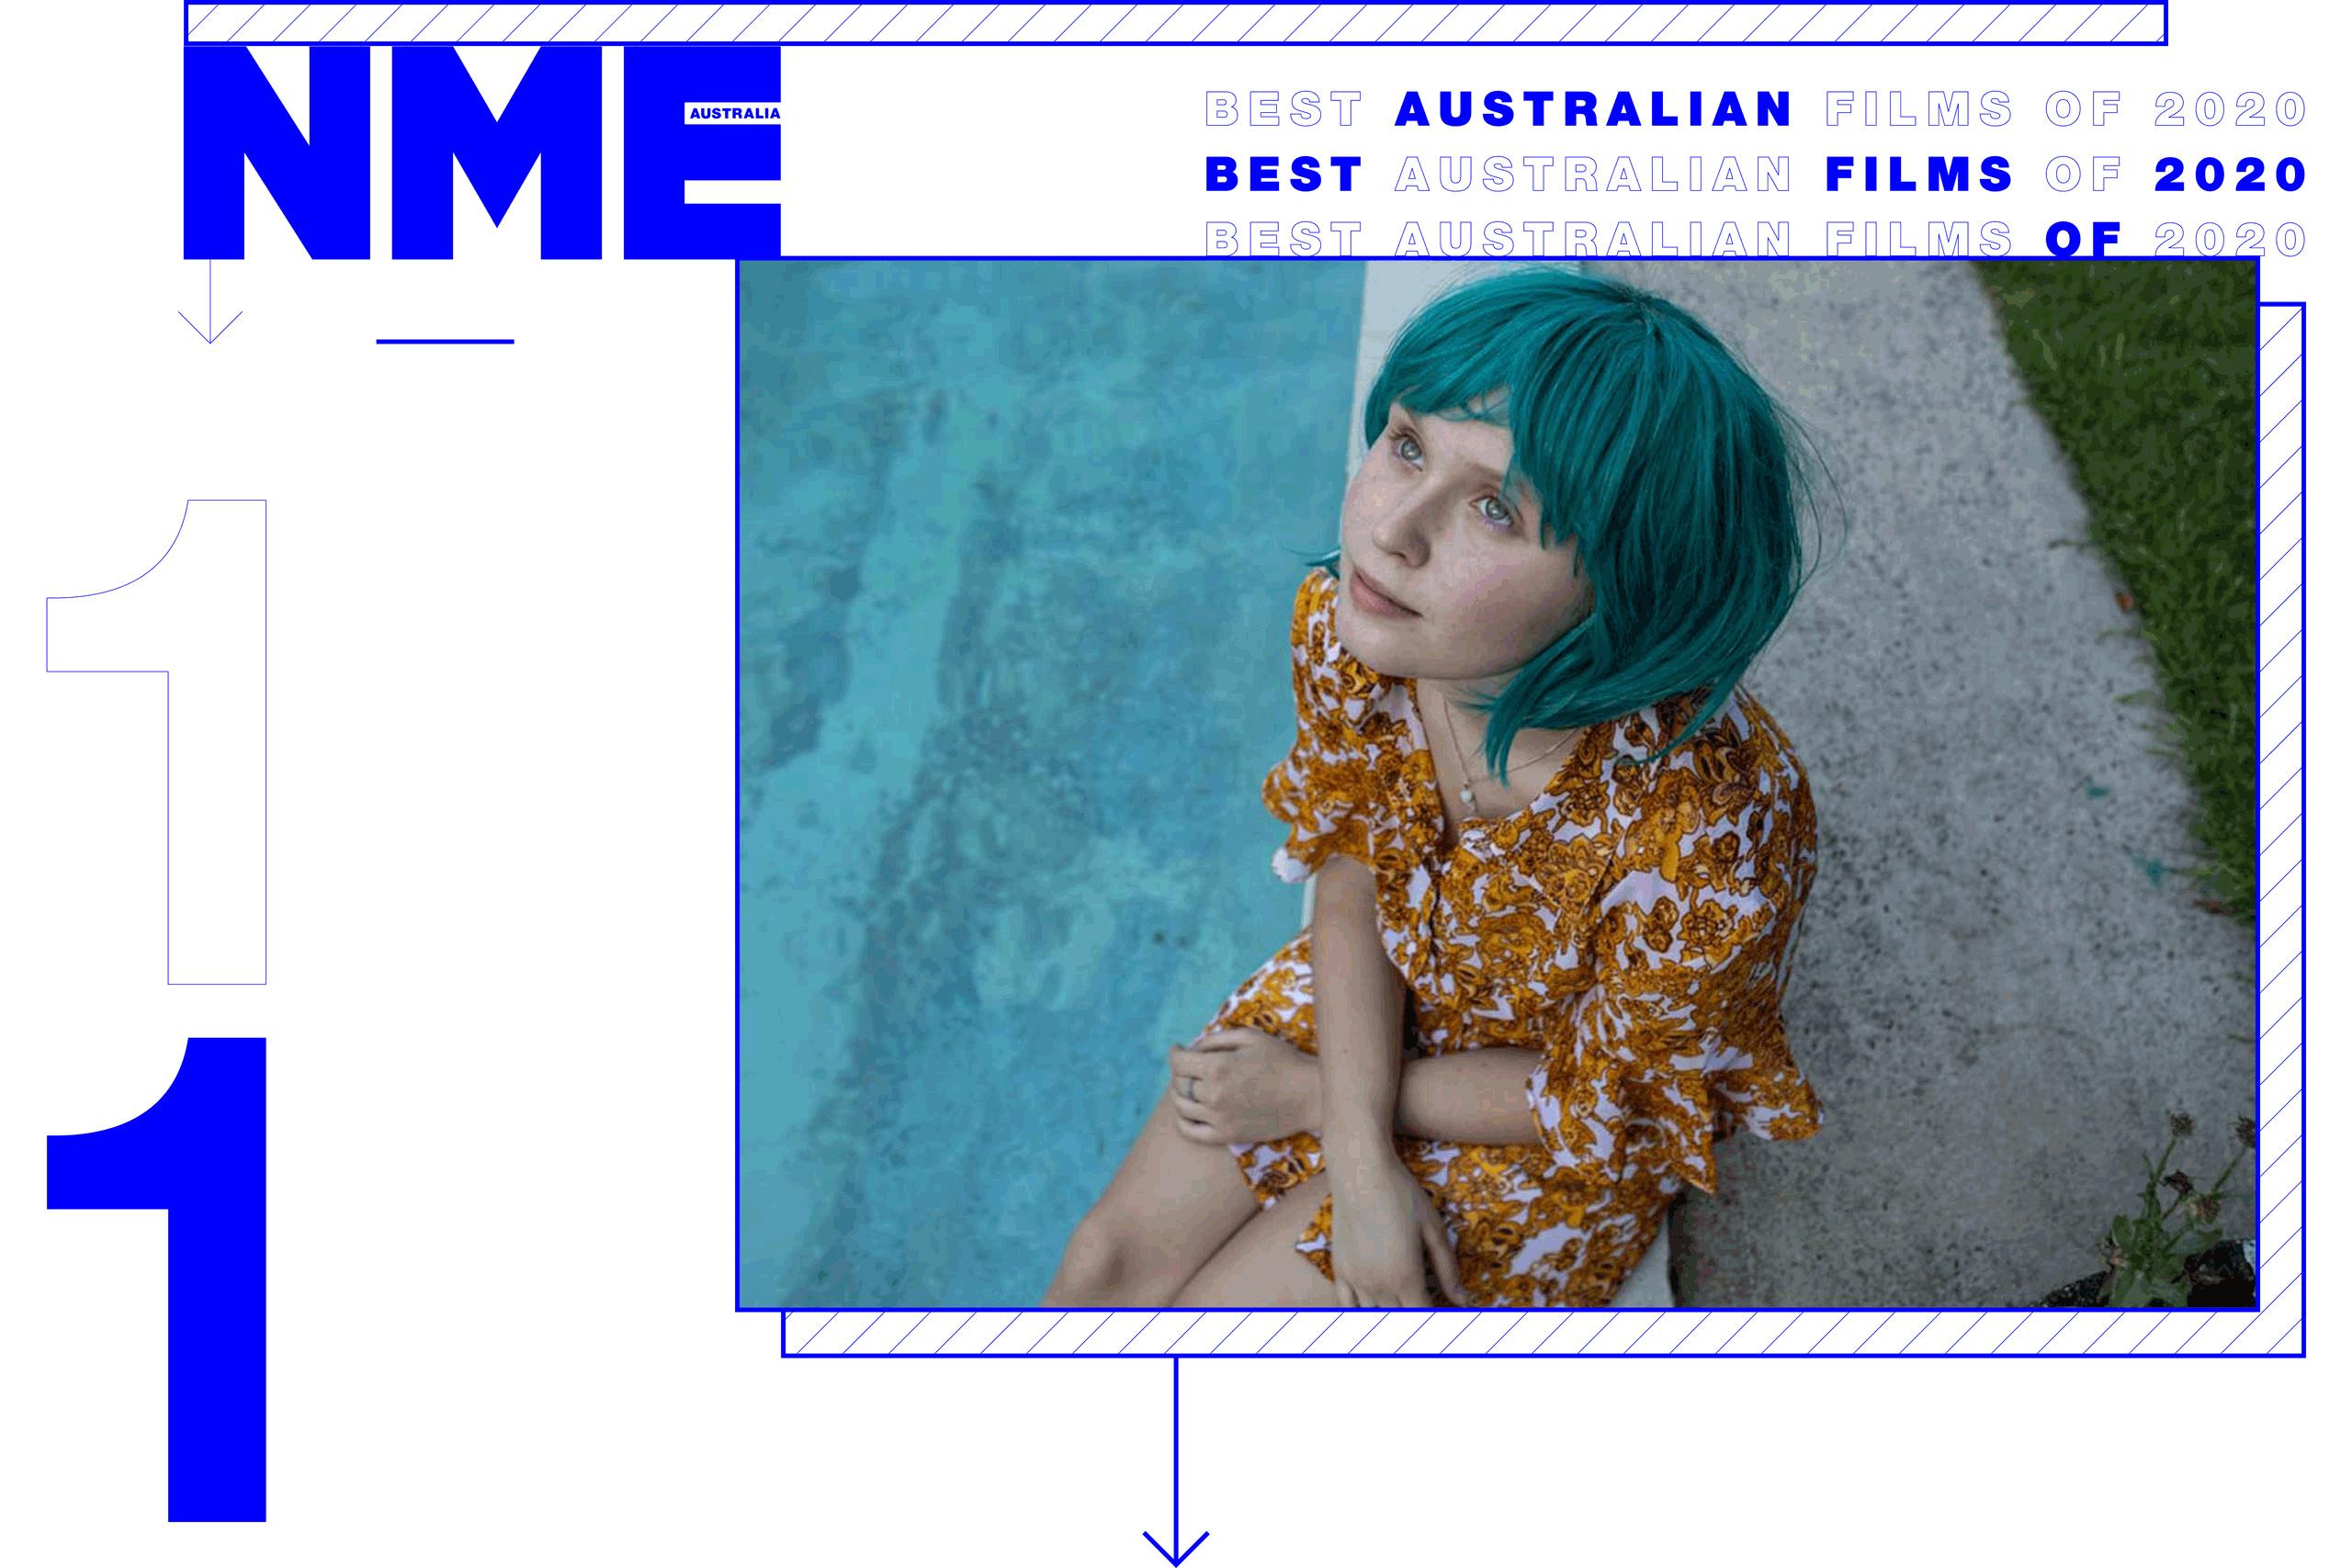 NME Australia Films Of The Year, Babyteeth